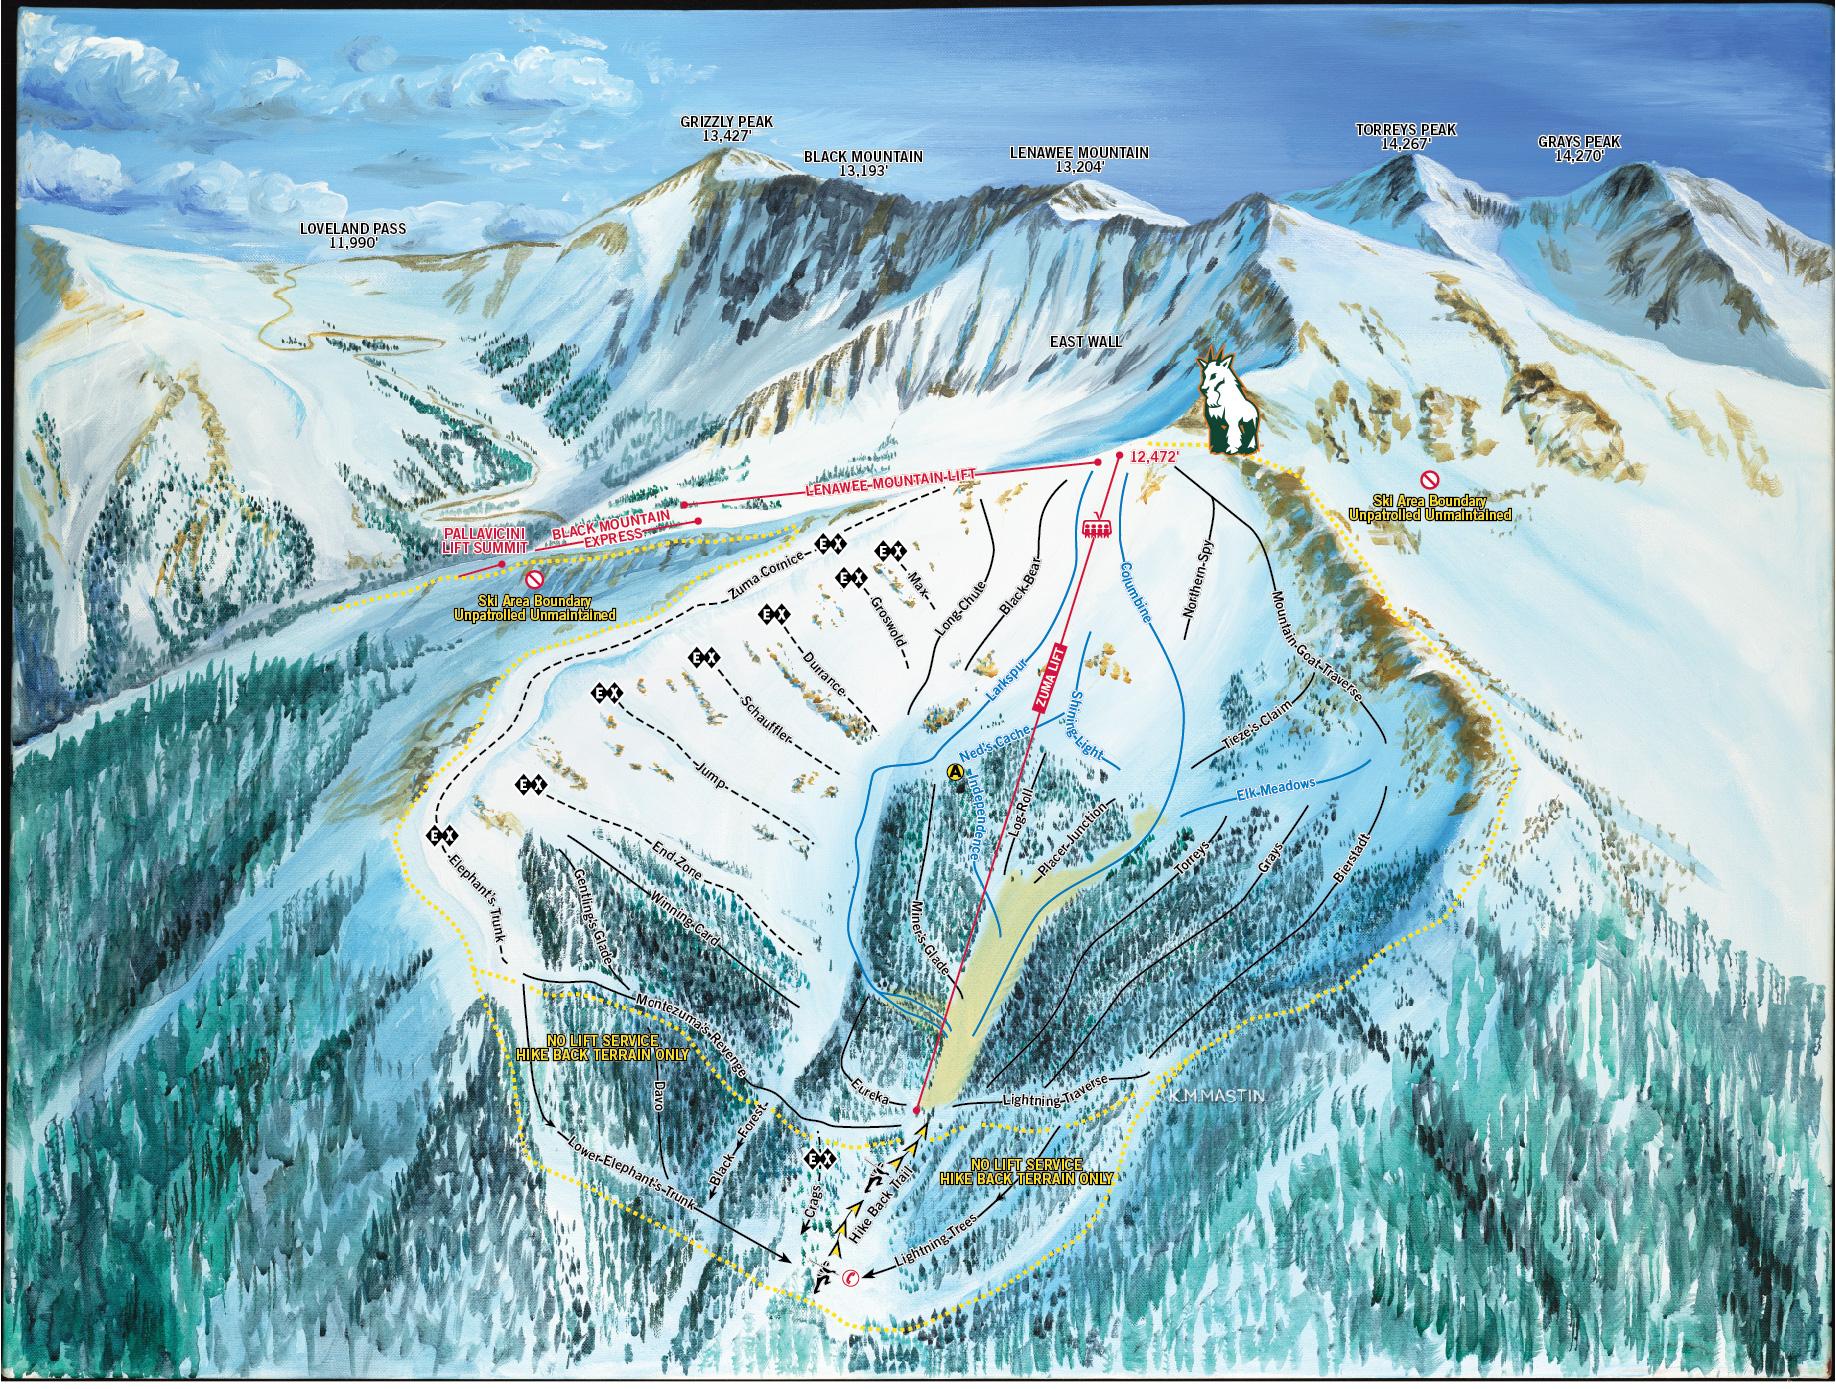 arapahoe basin skiing & snowboarding resort guide | evo